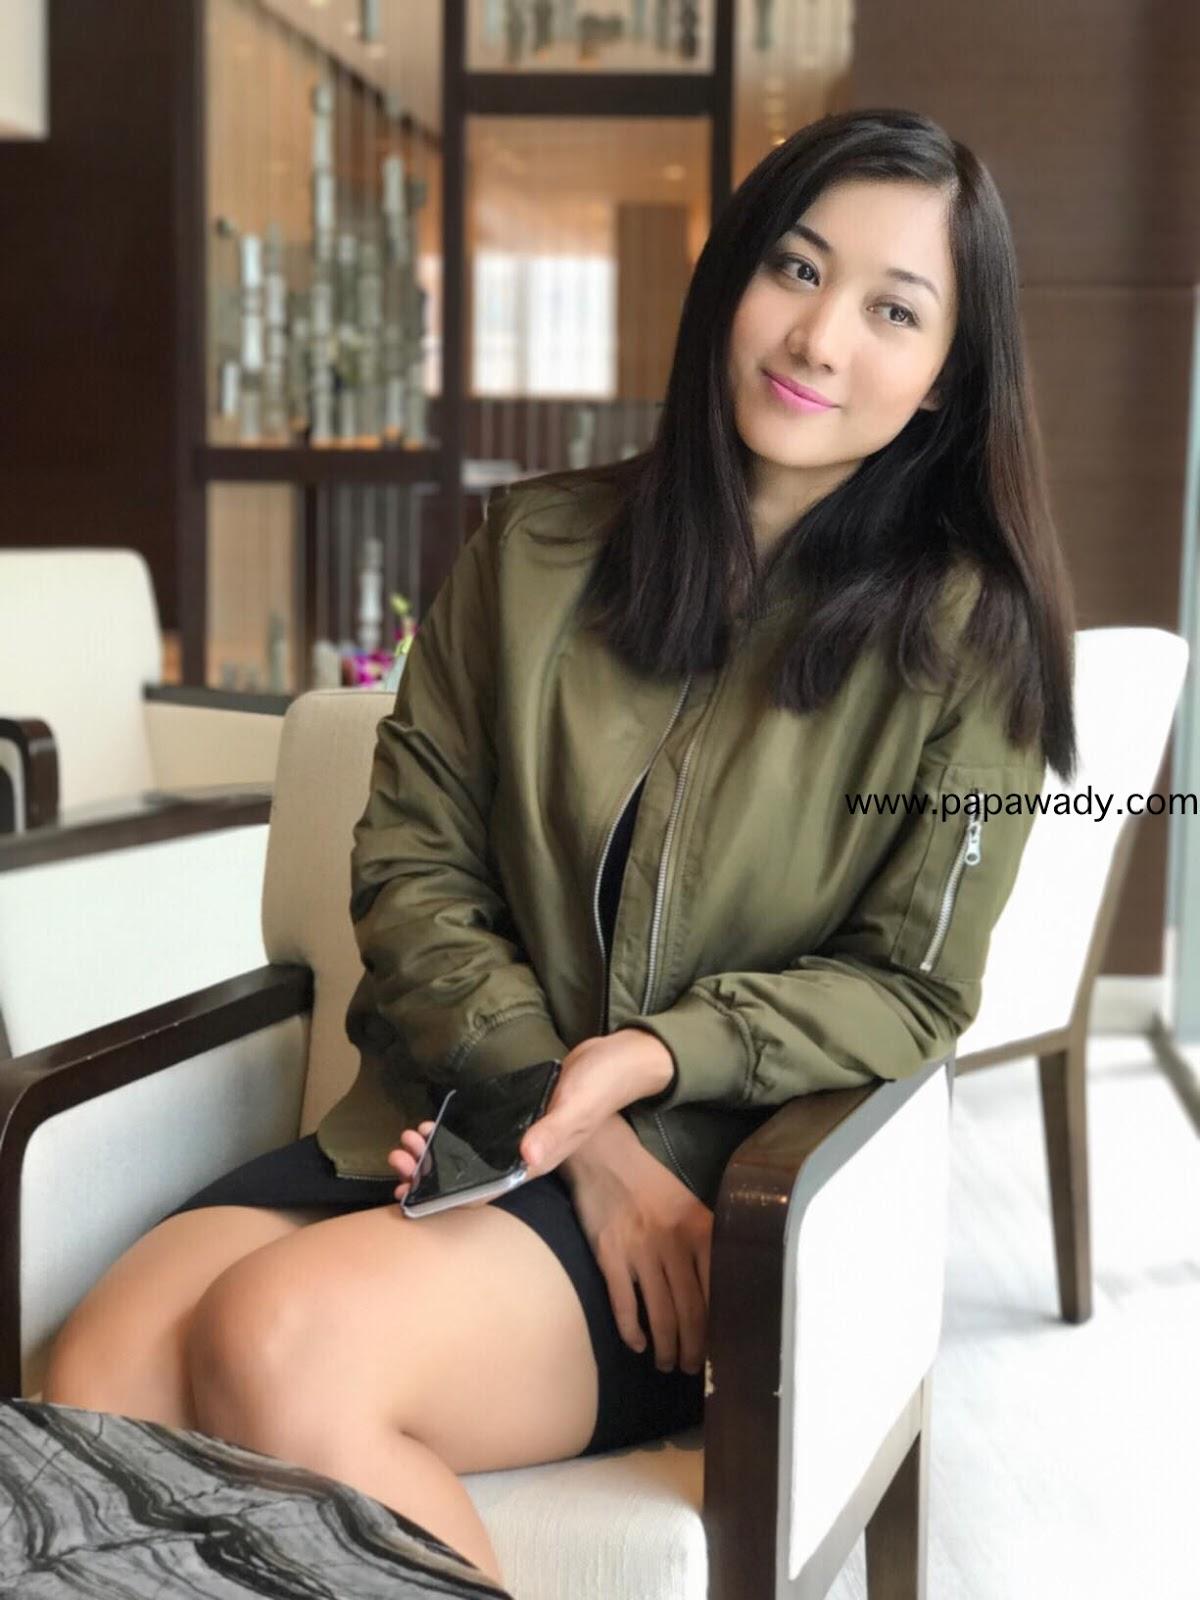 Lu Lu Aung A Chit Tat Sone Lu Thar ?